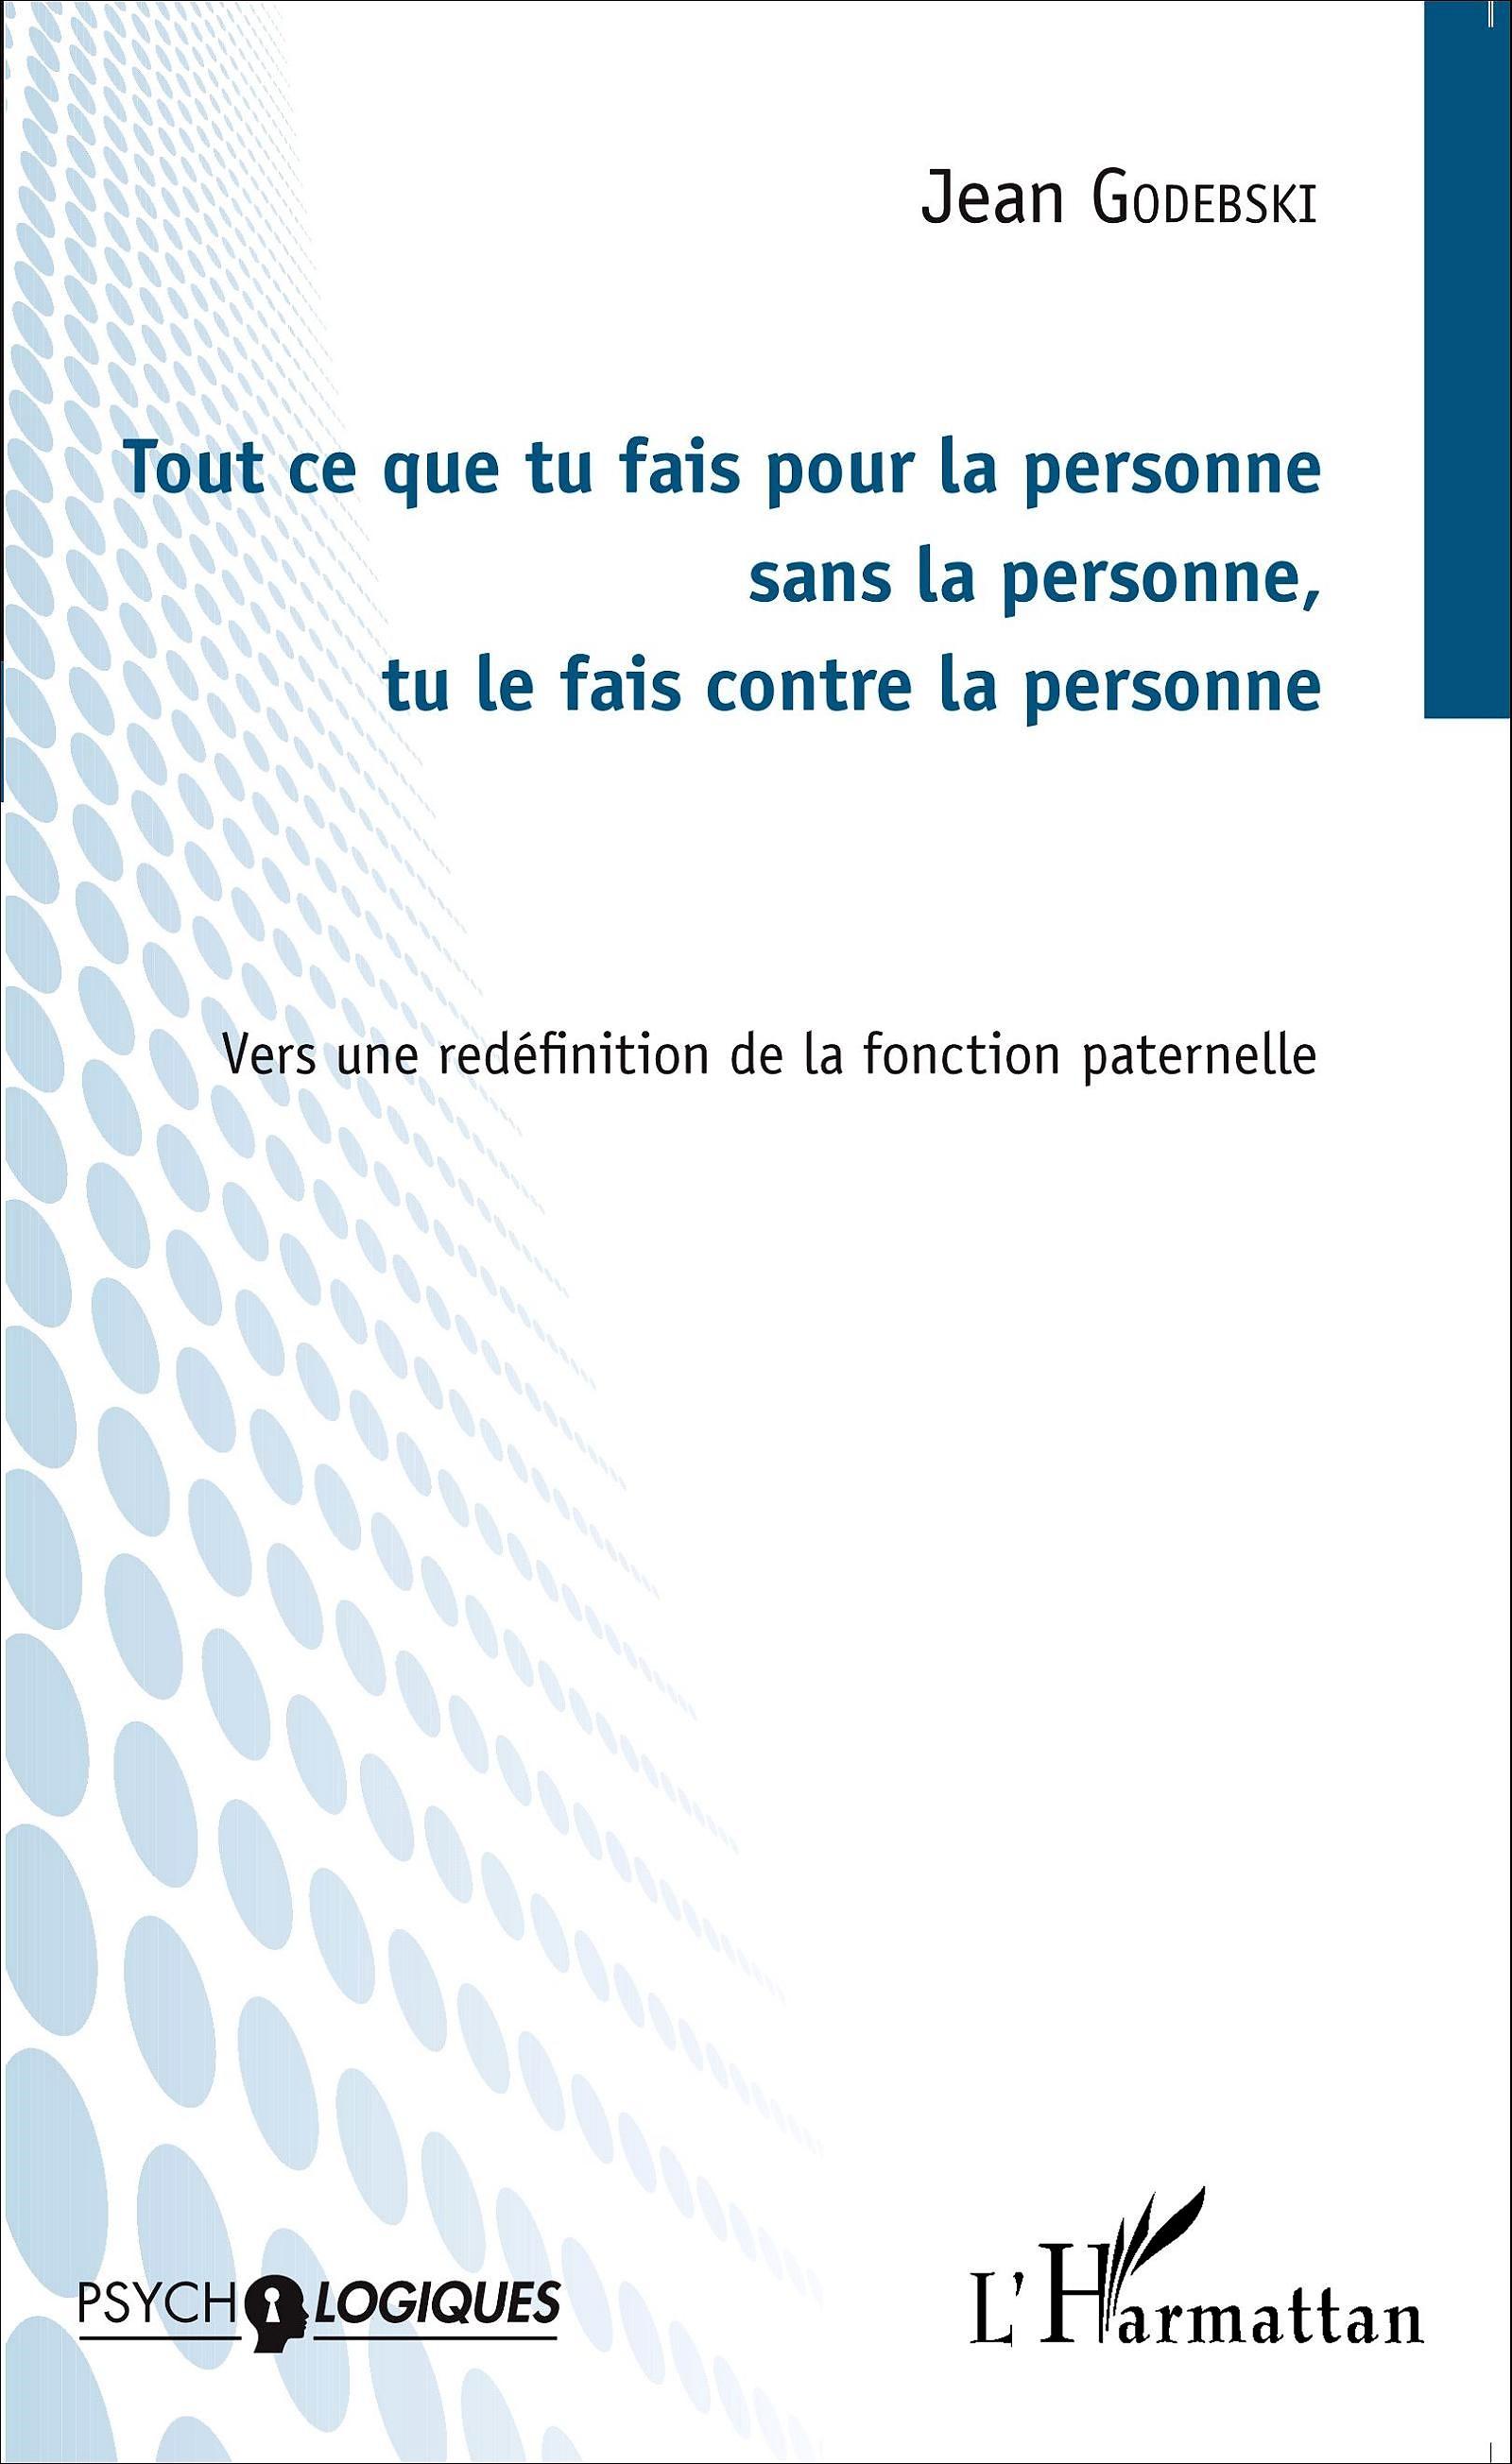 ouvrage-livre-jean-godebski-psy-nimes-harmattan